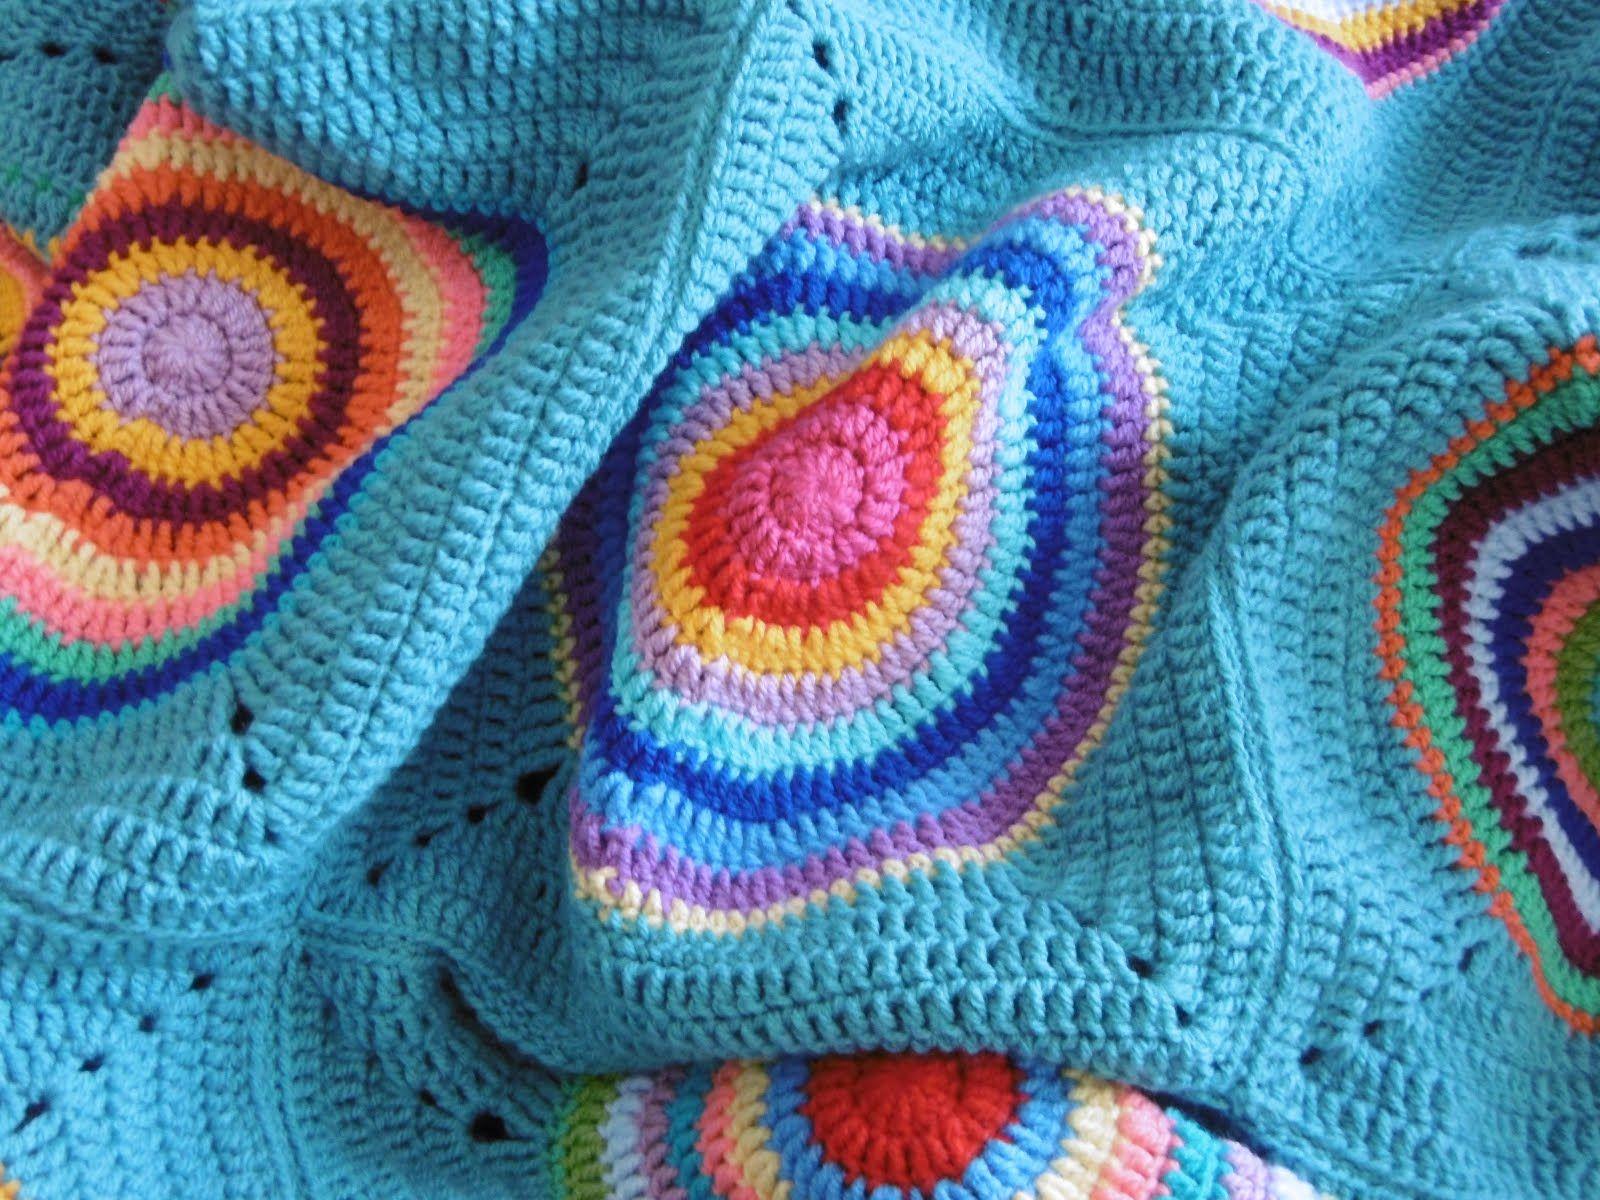 Oh Happy Day - Granny Square Decke | Stricken Decke | Pinterest ...